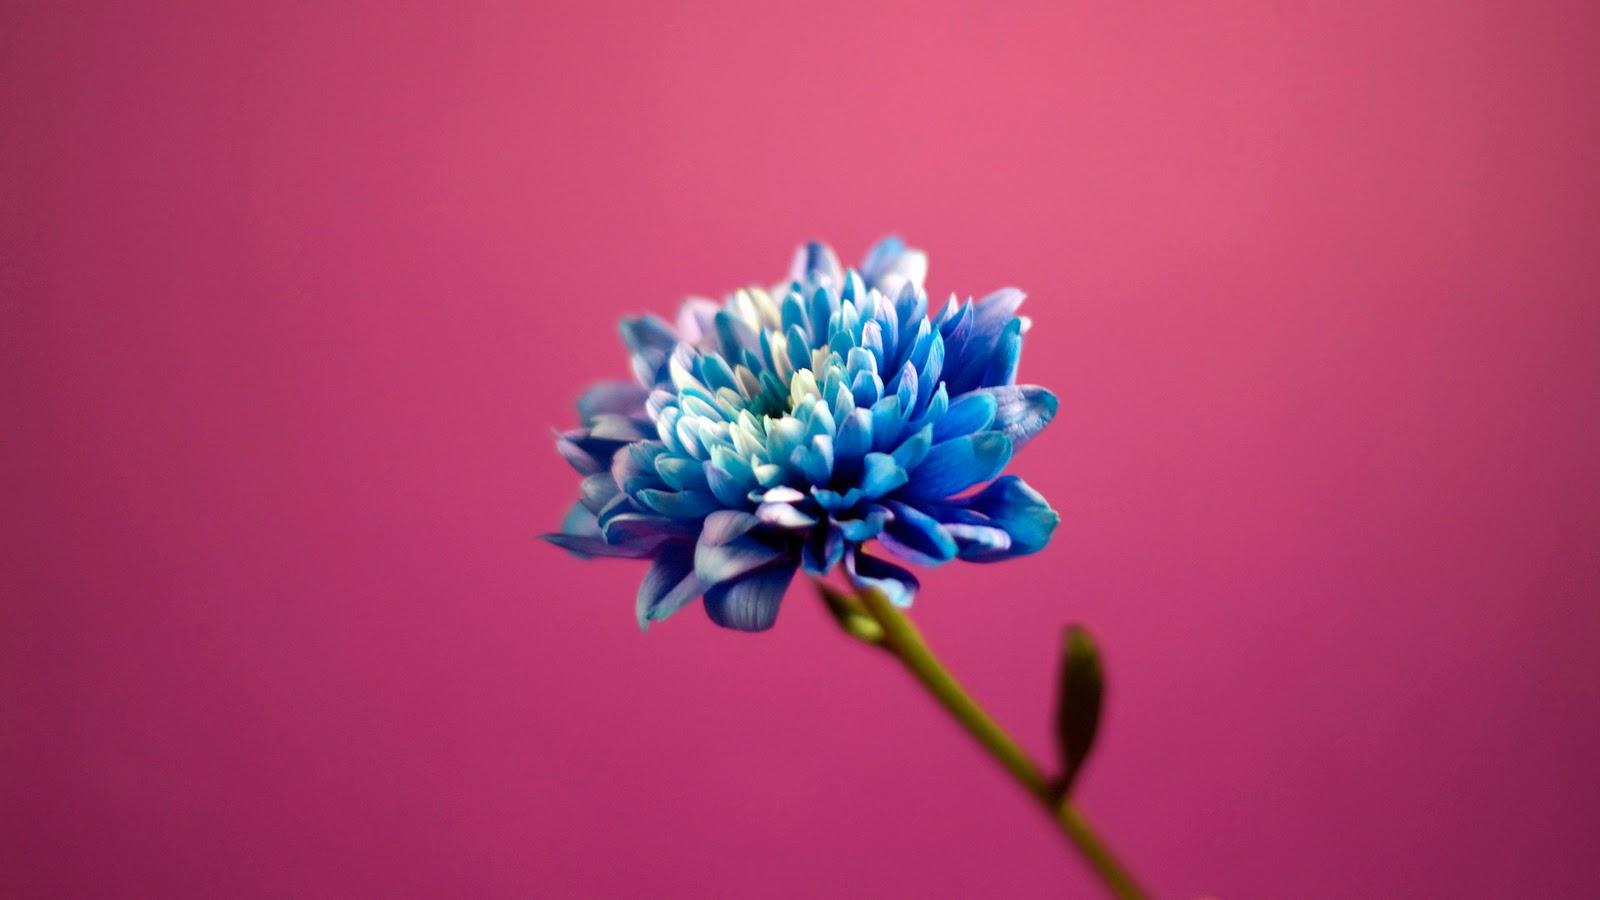 Pink Hd Abstract Best Top Desktop 84885 Wallpaper wallpaper